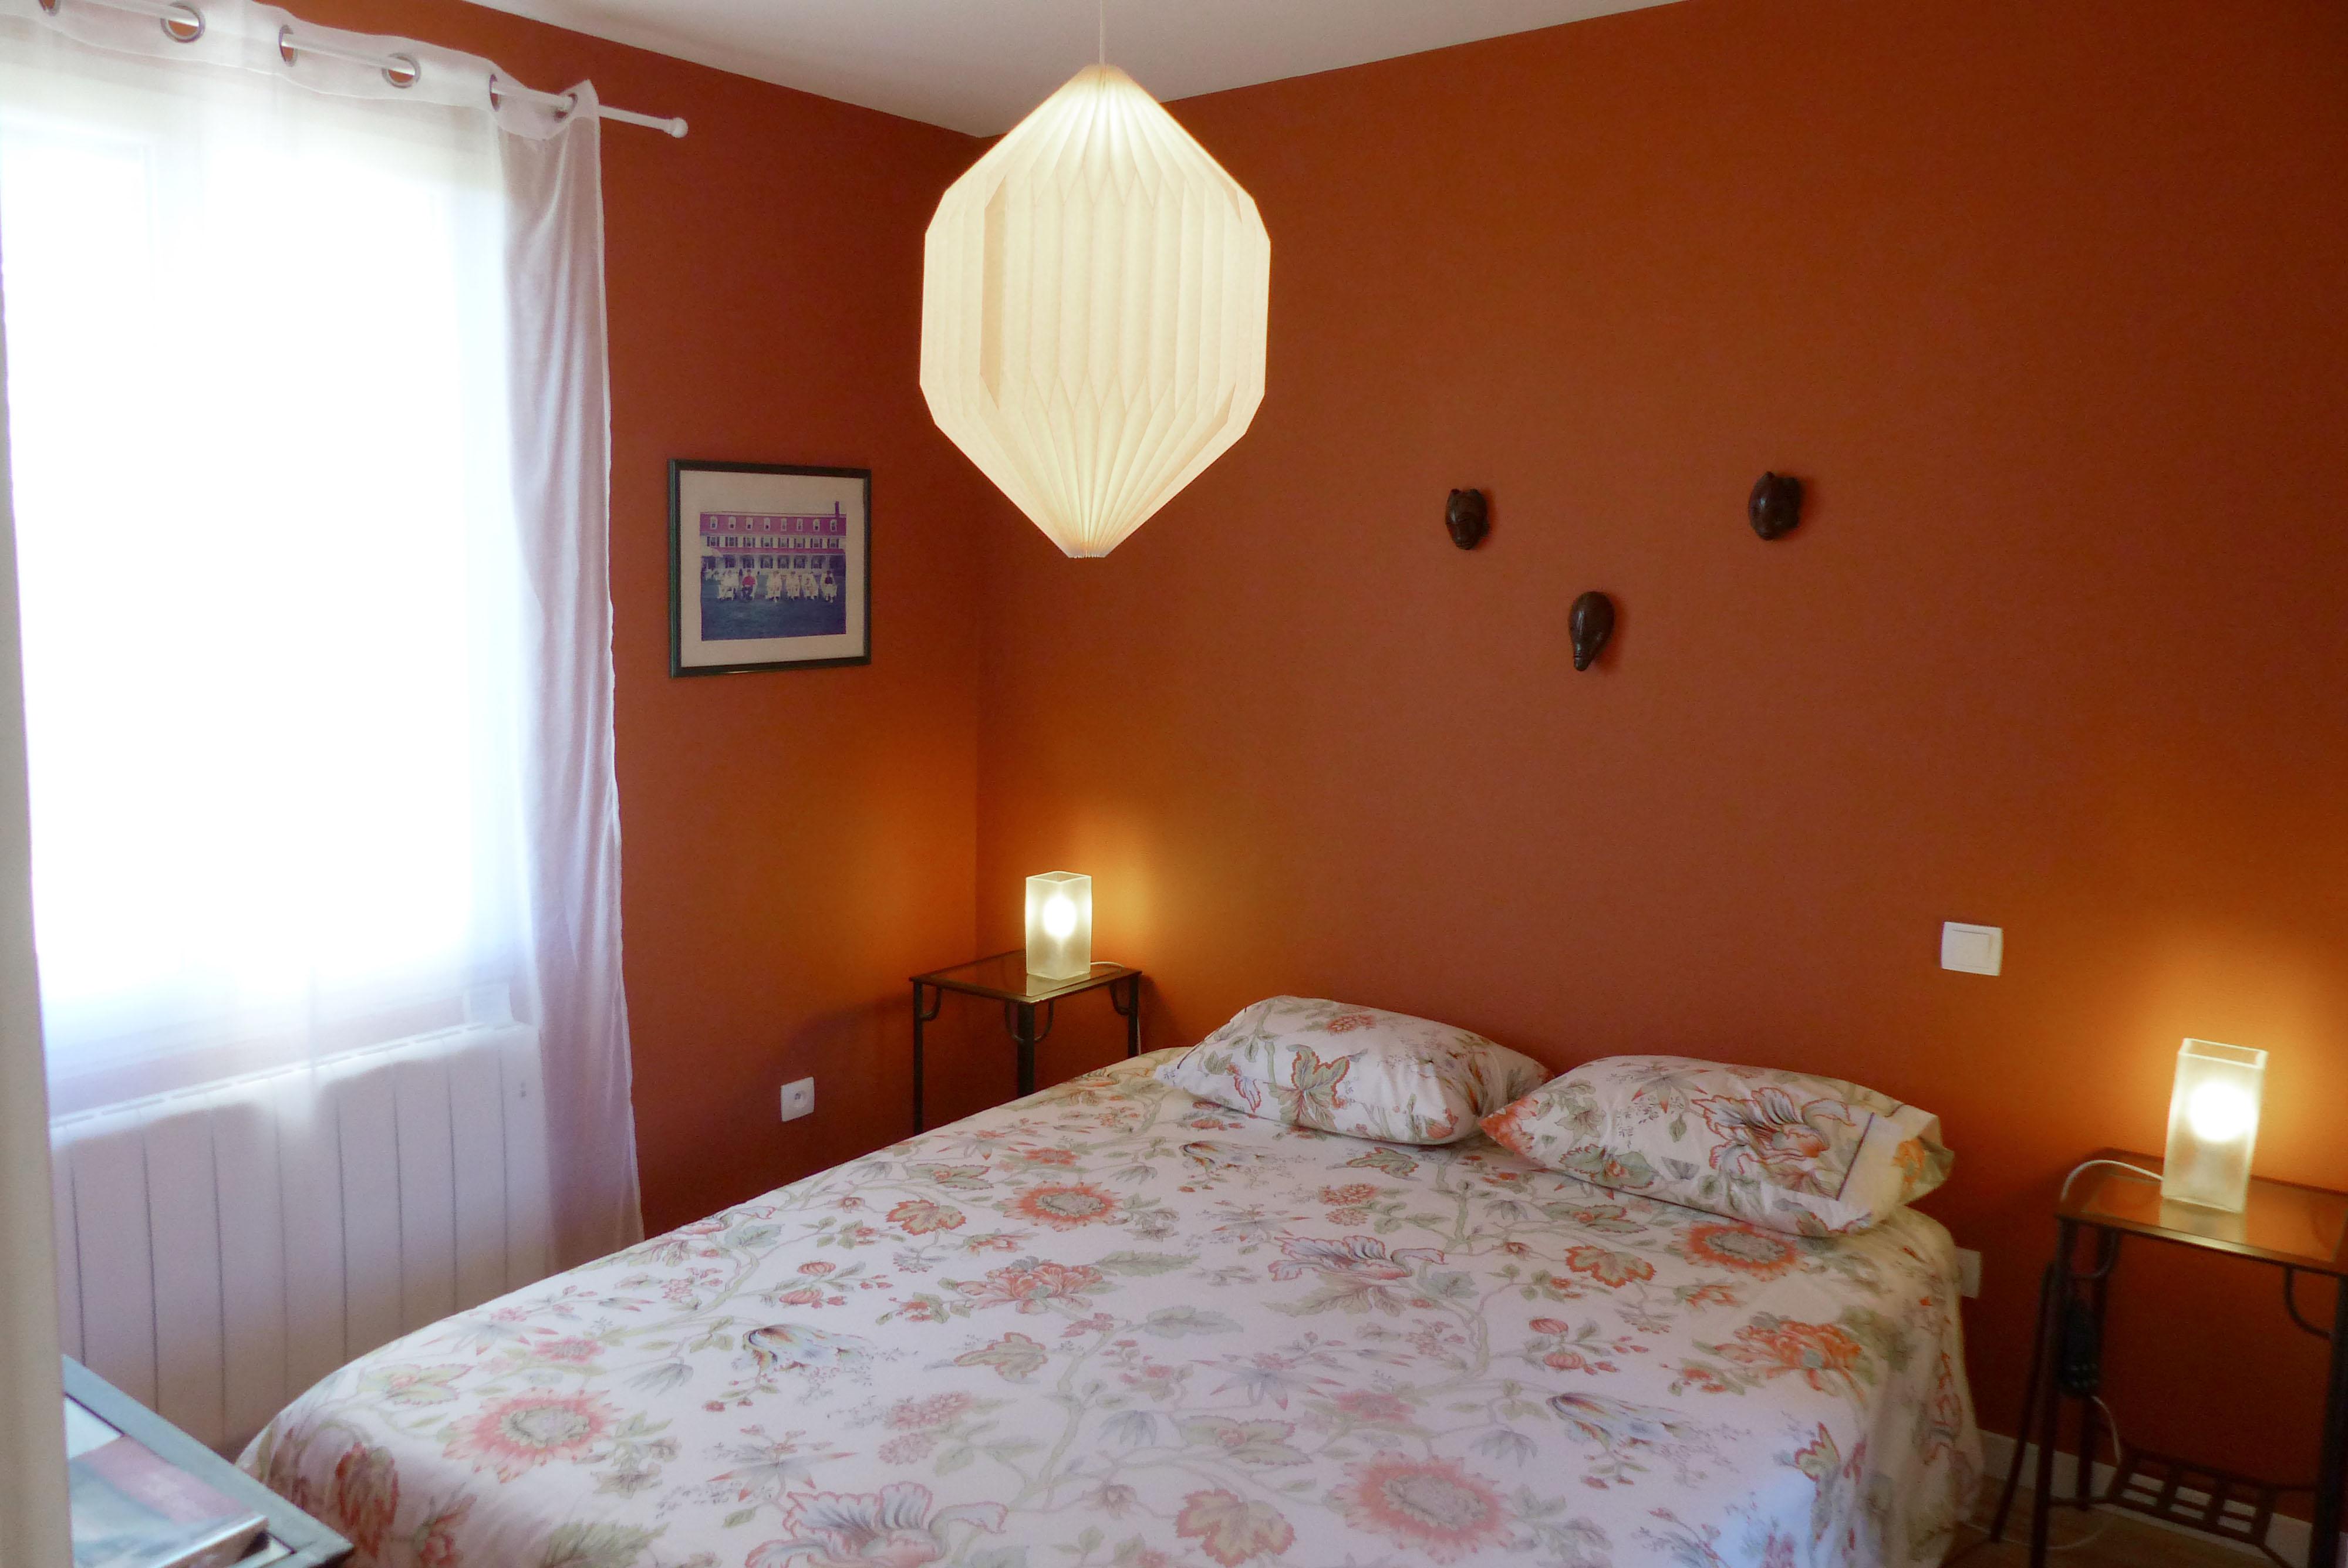 chambre a coucher greta avec des id es int ressantes pour la conception de la chambre. Black Bedroom Furniture Sets. Home Design Ideas